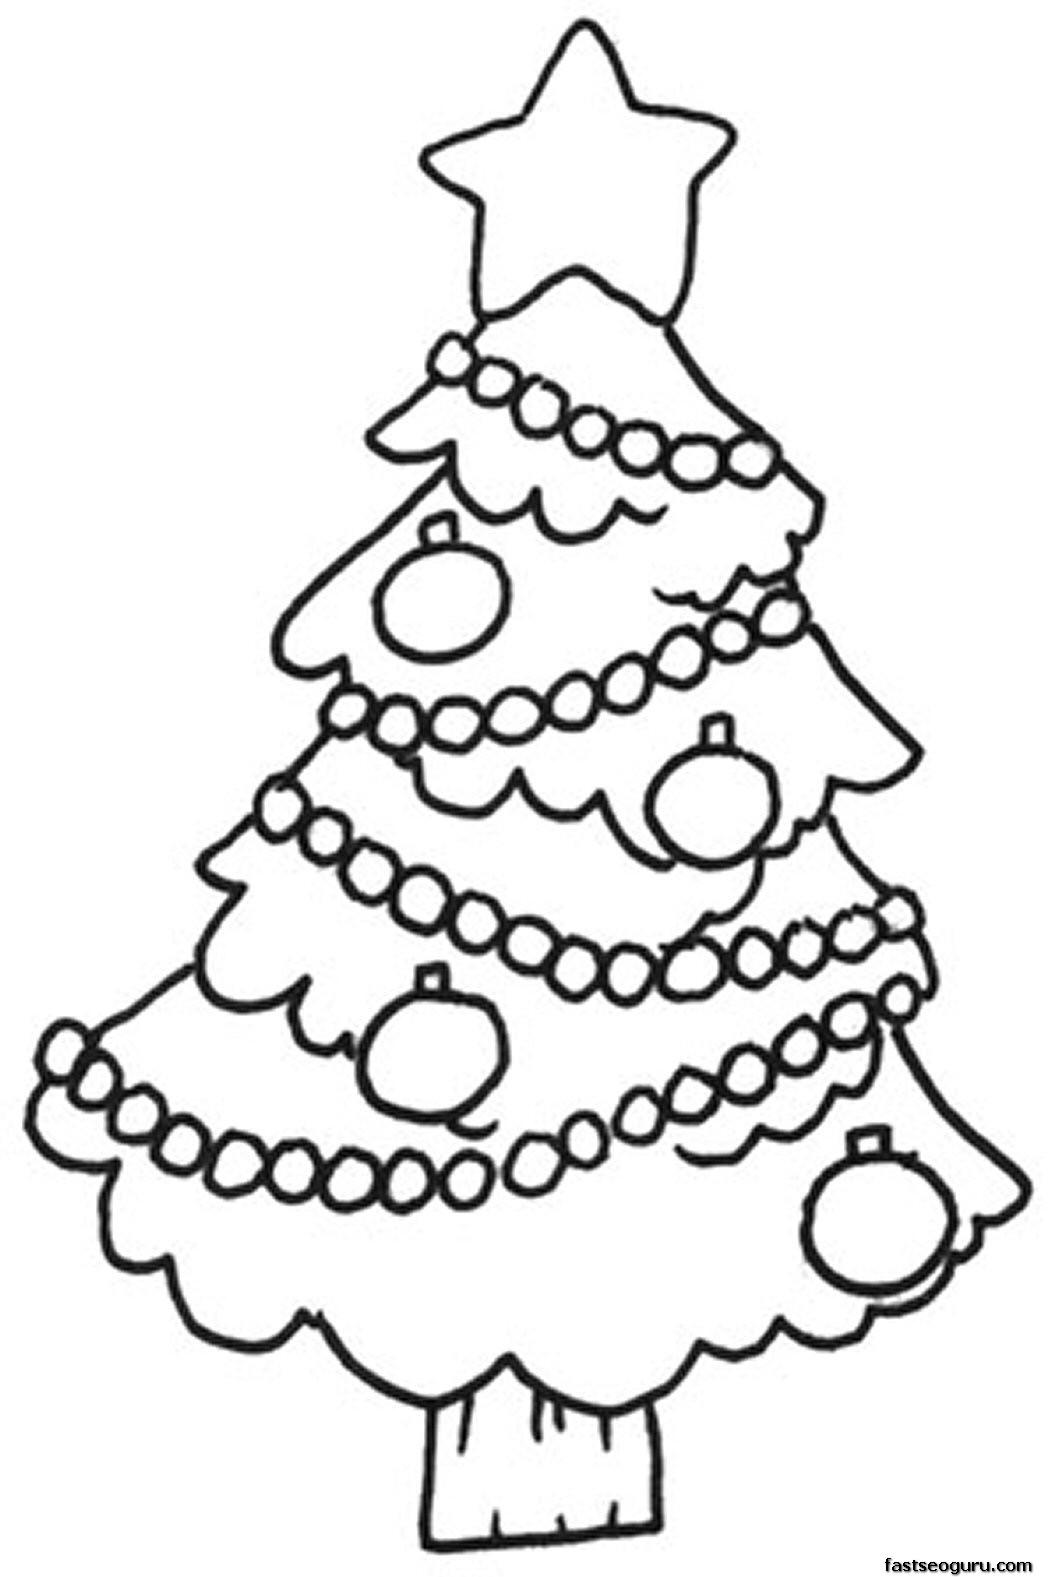 1052x1577 Santa Claus Coloring Pages Line Drawings Printable For Good Santa